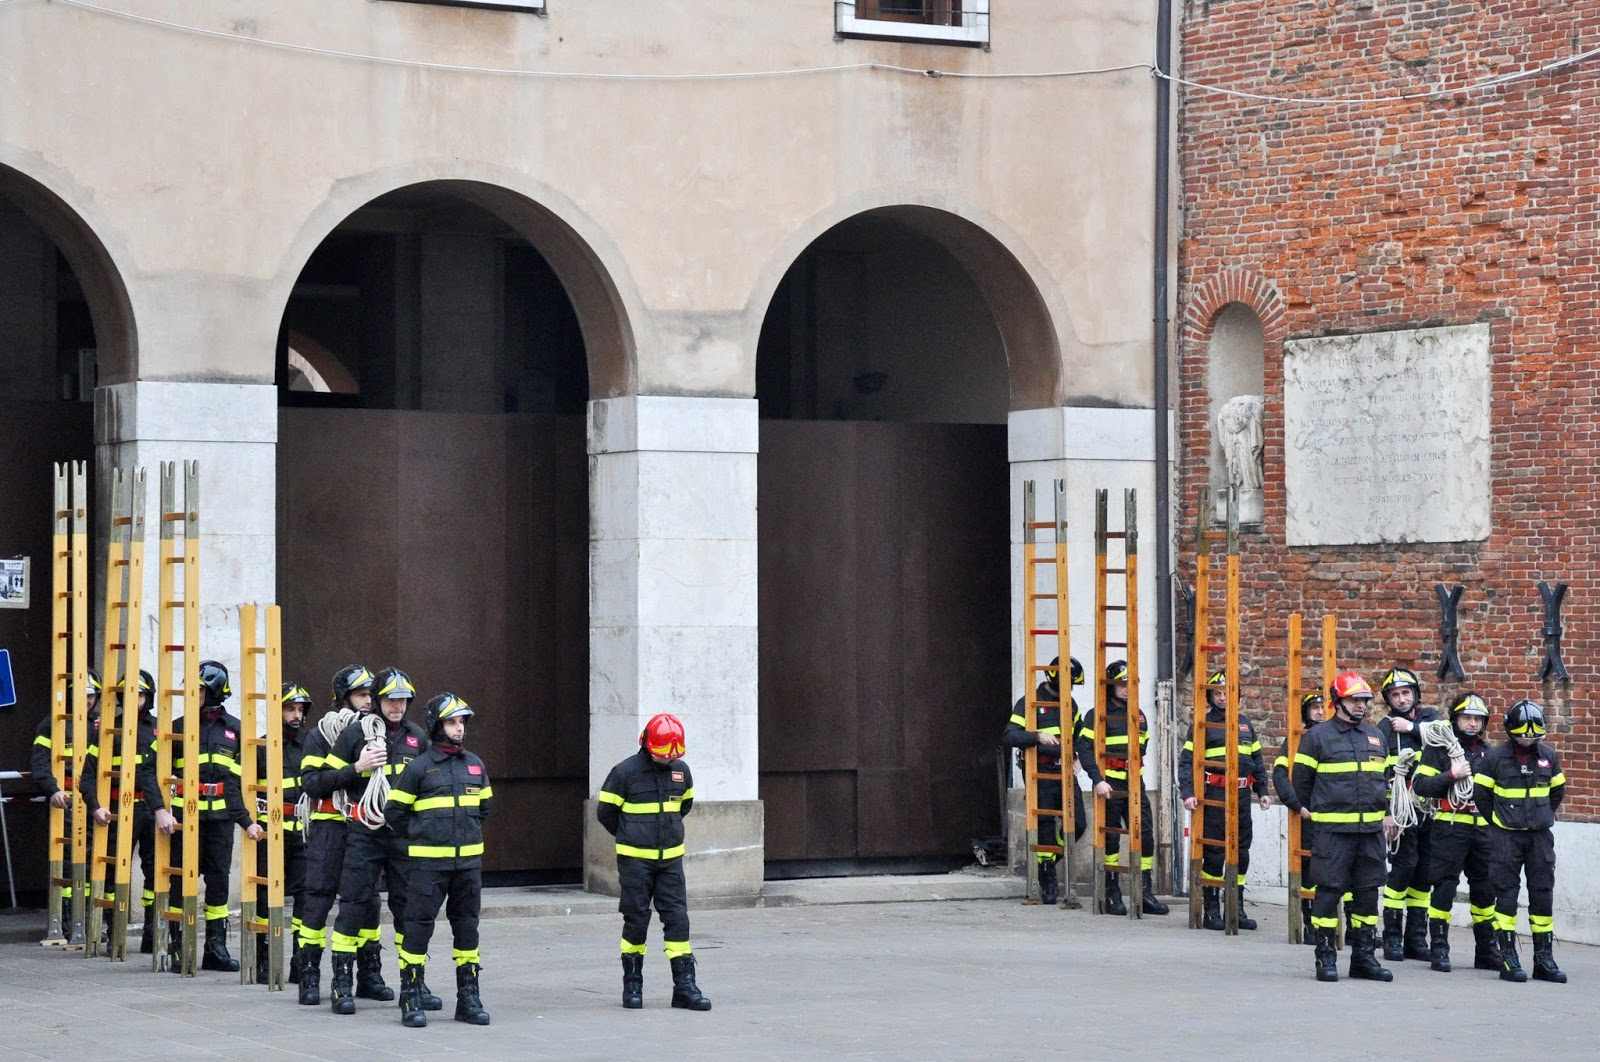 Firefighting demonstration, Piazza dei Signori, Saint Barbara celebration, Vicenza, Veneto, Italy